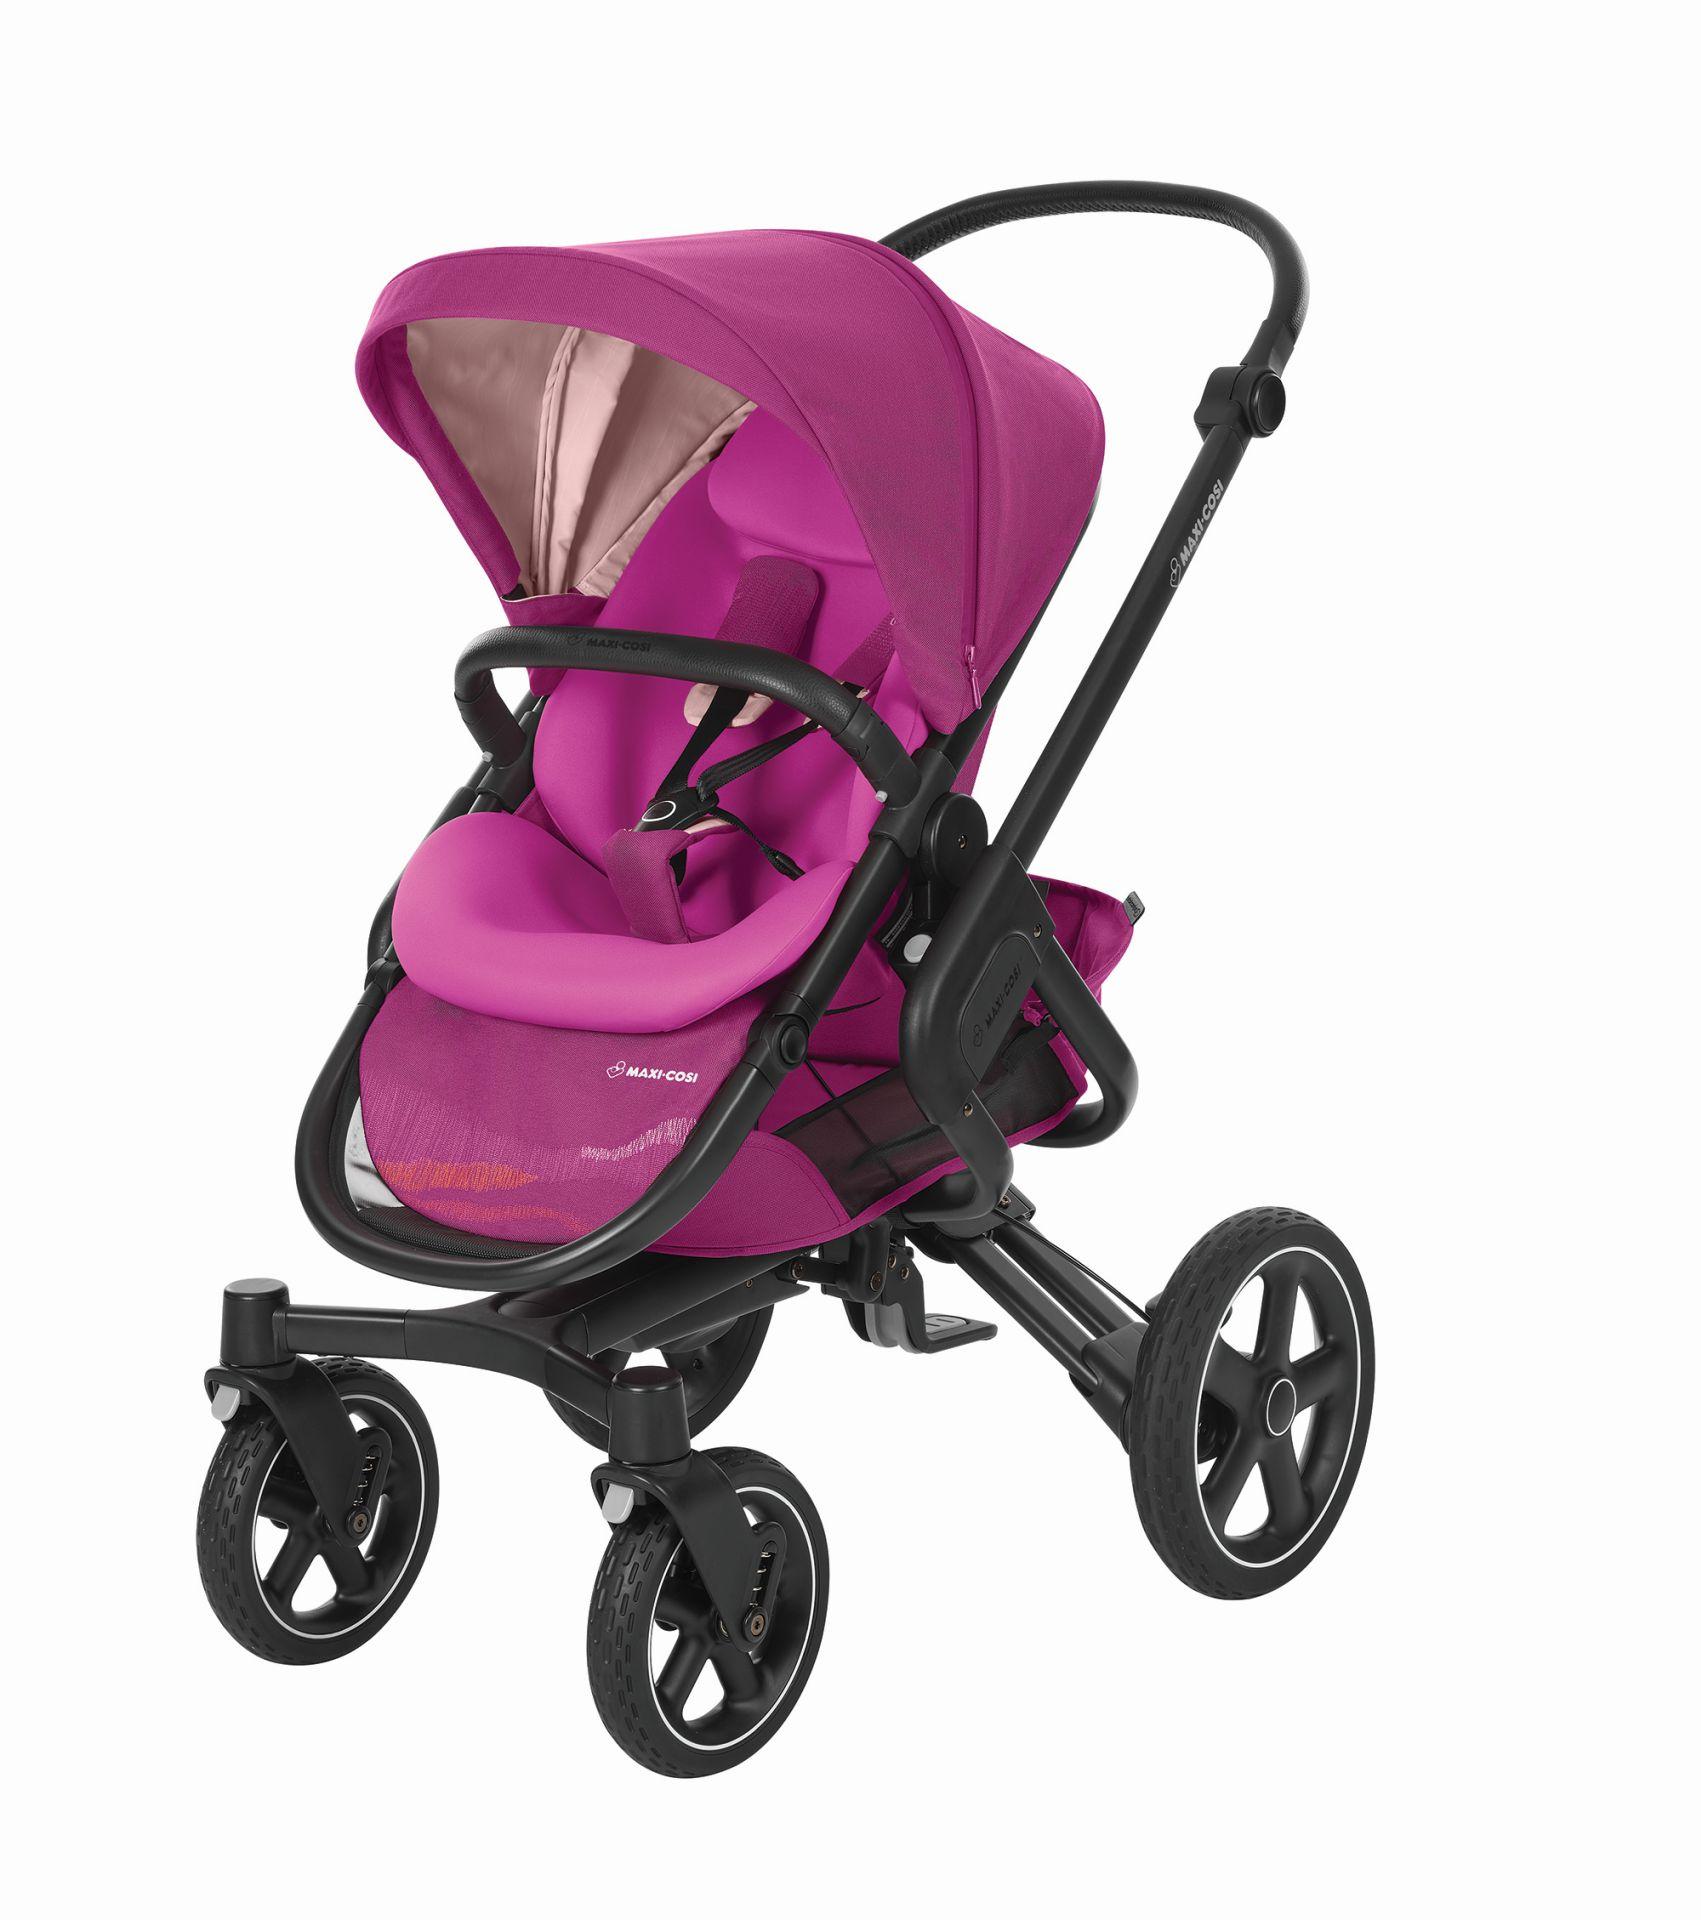 MAXI-COSI Nova 4 Frequency Pink Sporta rati